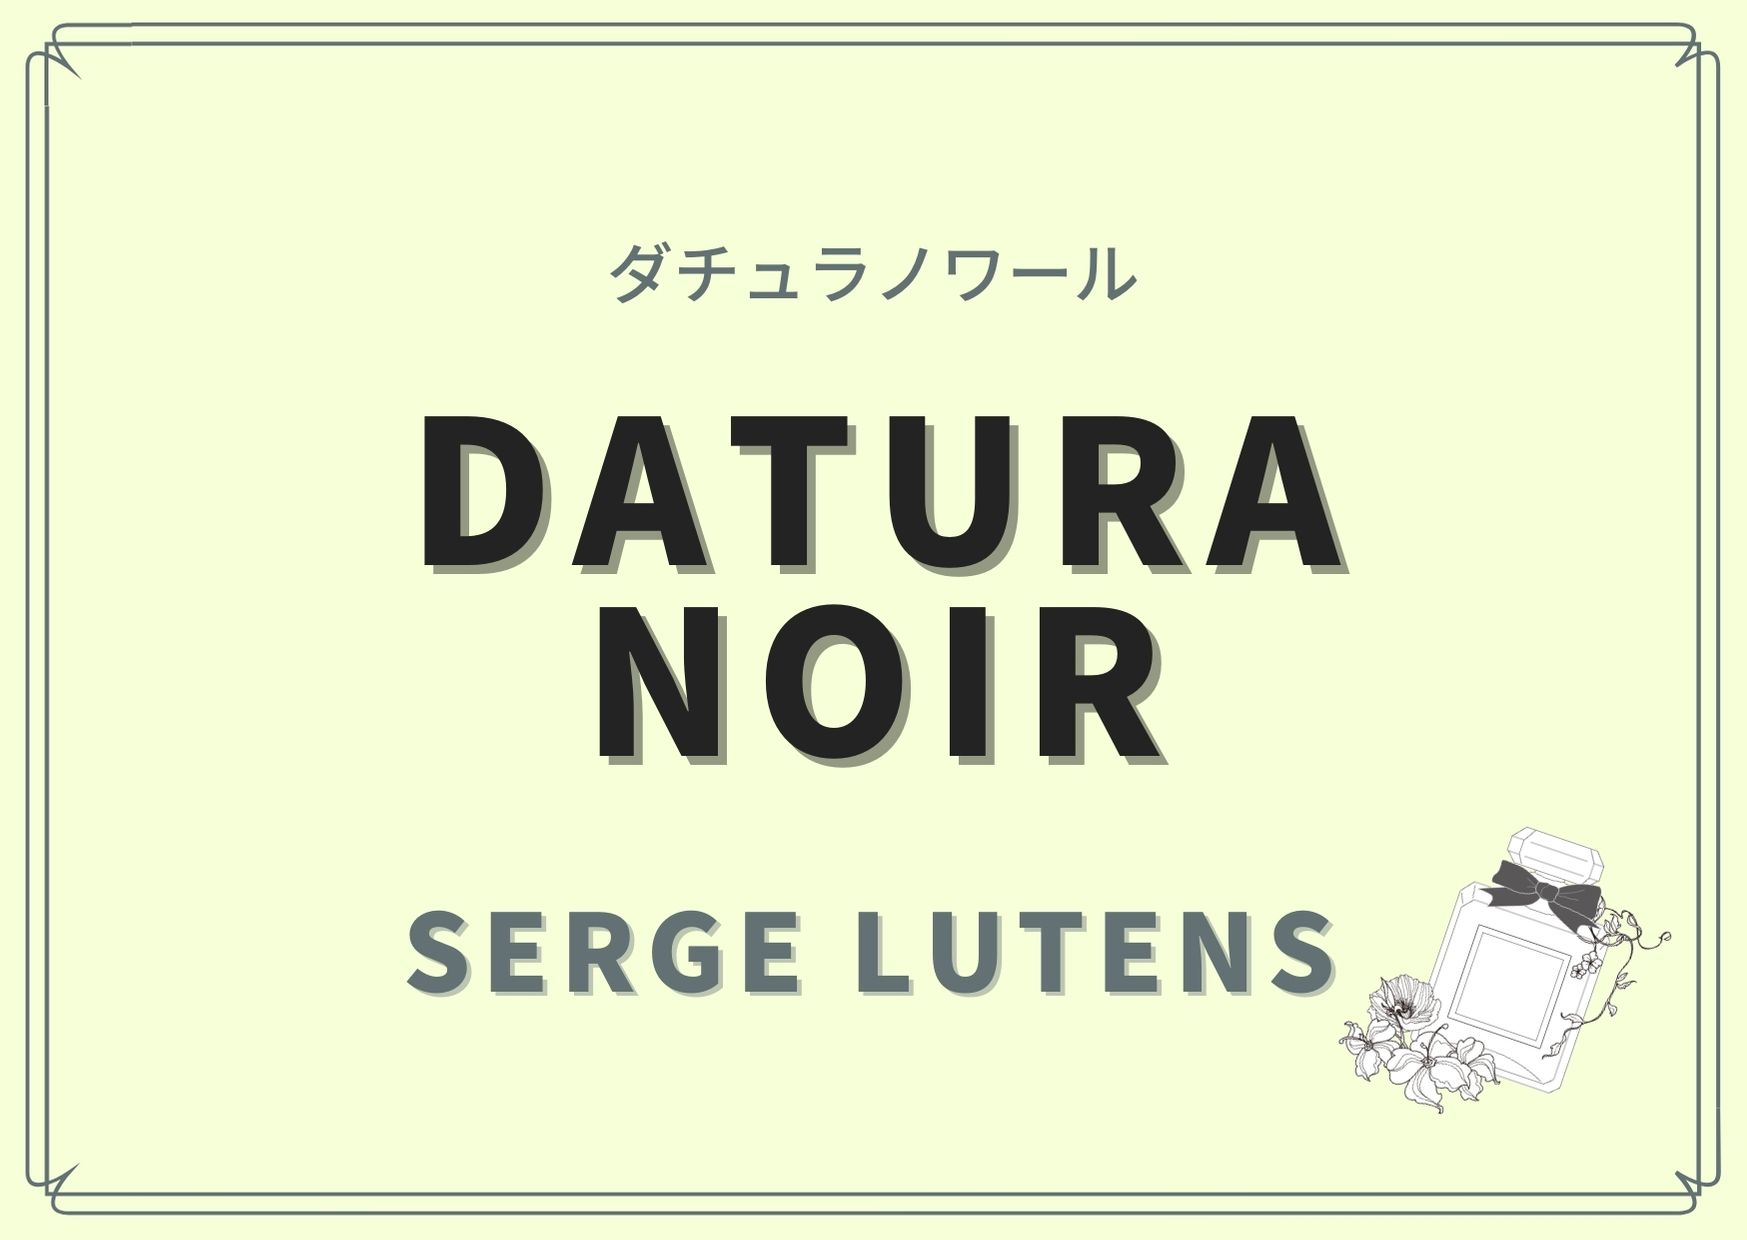 Datura noir(ダチュラノワール)/SERGE LUTENS(セルジュ ルタンス)